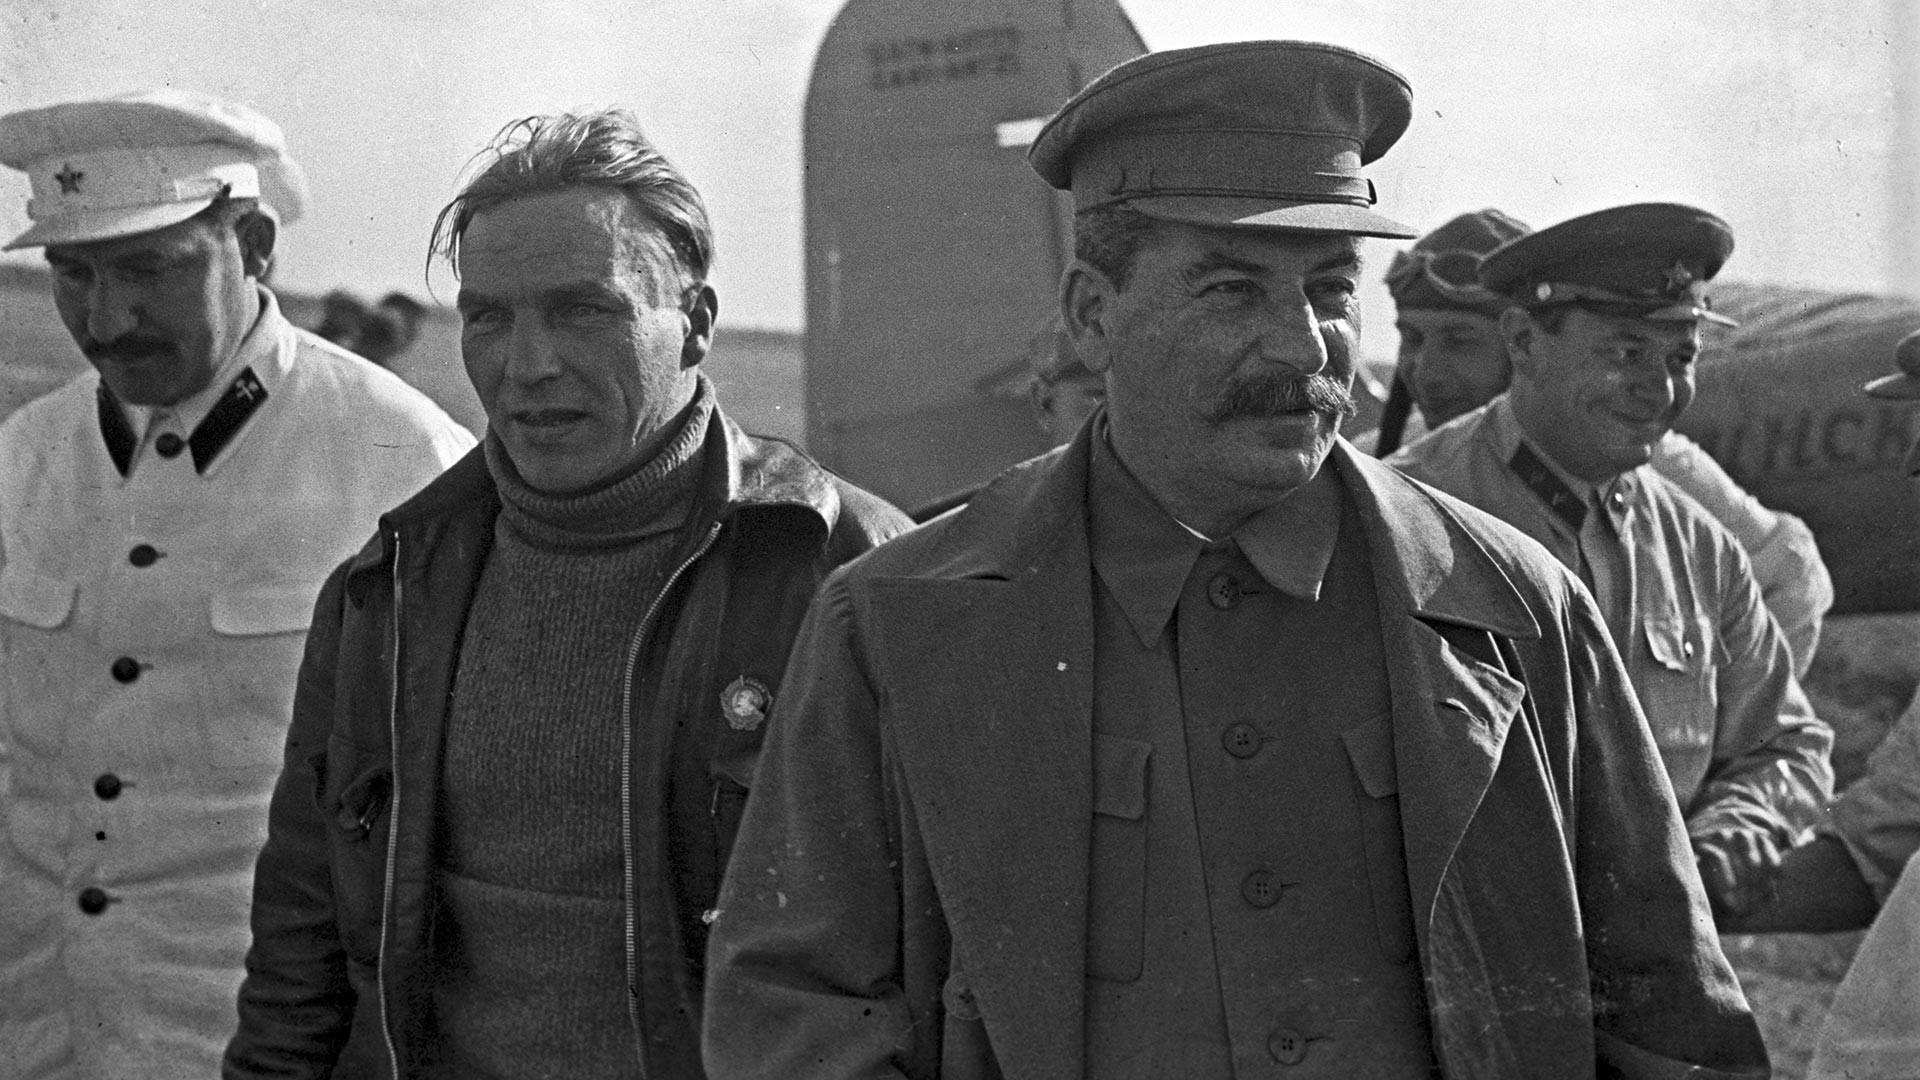 Generalni sekretar Centralnog komiteta Sveruske komunističke partije (boljševika) i član Politbiroa Josif Staljin sa članom Politbiroa CK VKP(b) Lazarom Kaganovičem prilikom dočeka sovjetskog probnog pilota Valerija Čkalova (u sredini) na Ščolkovskom aerodromu 10. kolovoza 1936.